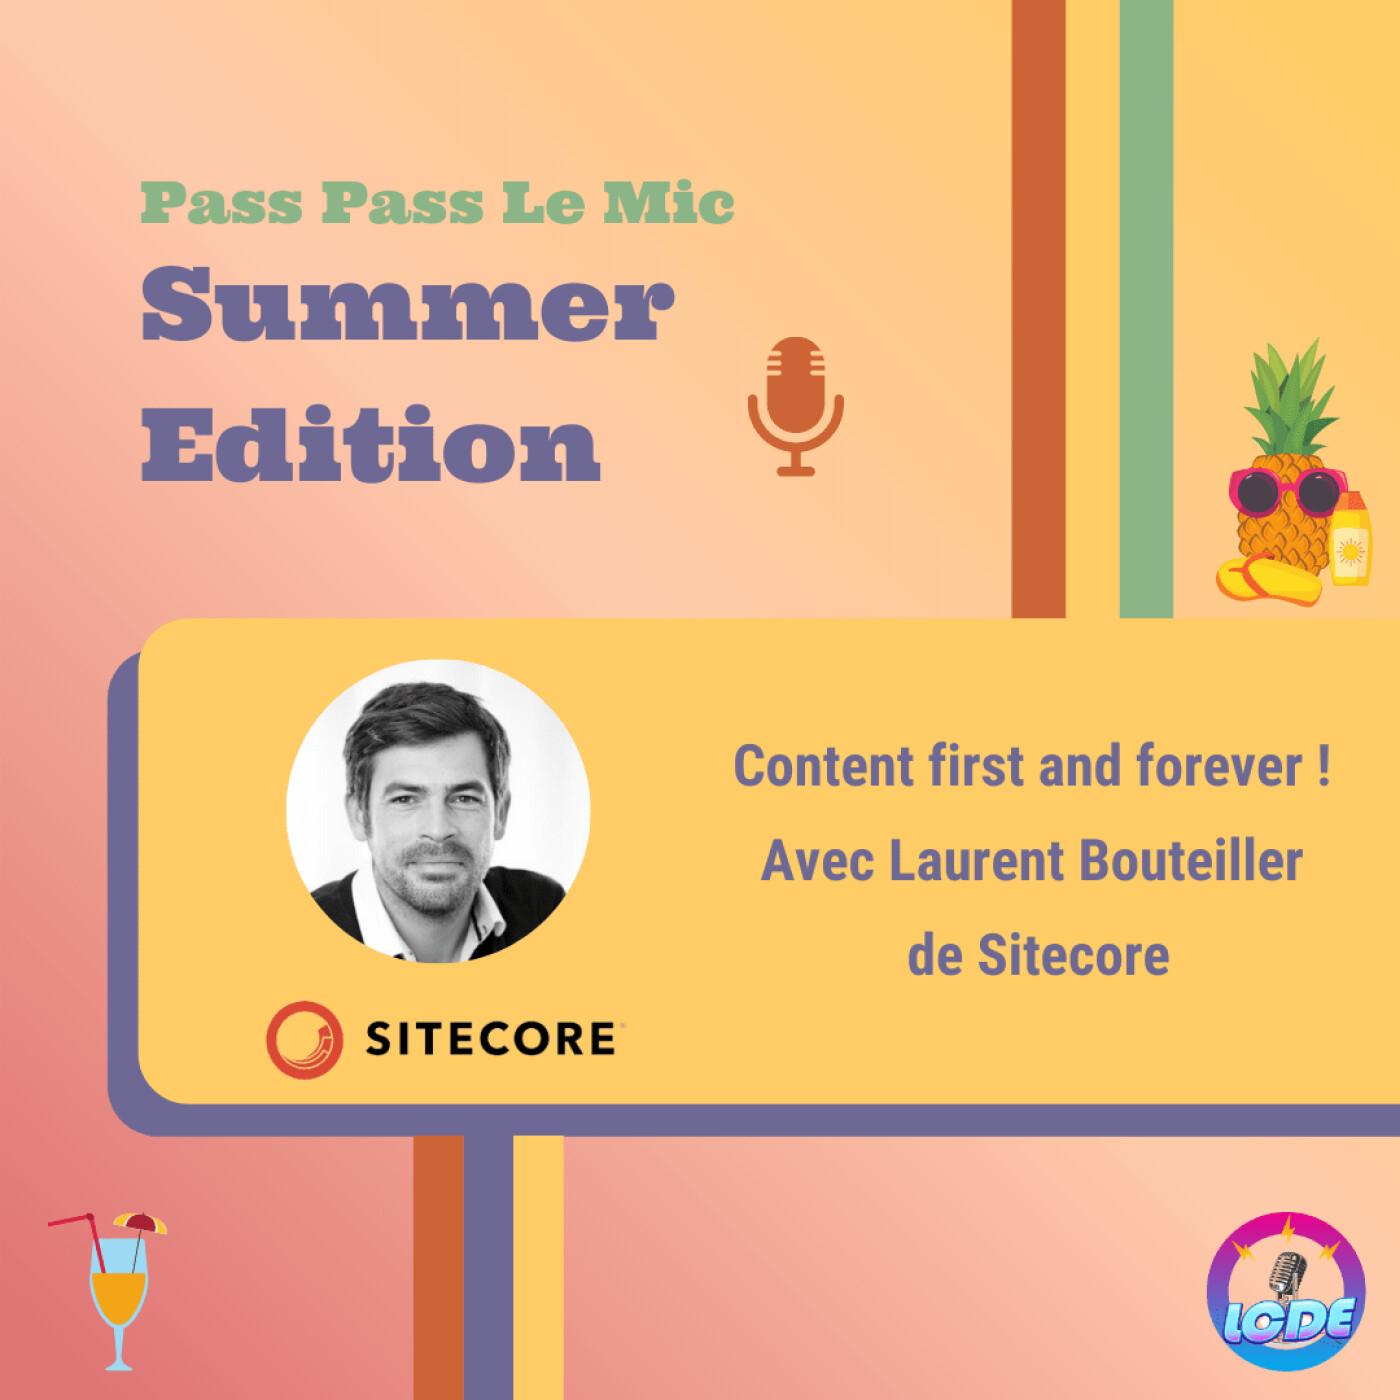 PPLM Summer Edition - Content First and forever ! Avec Laurent Bouteiller de Sitecore